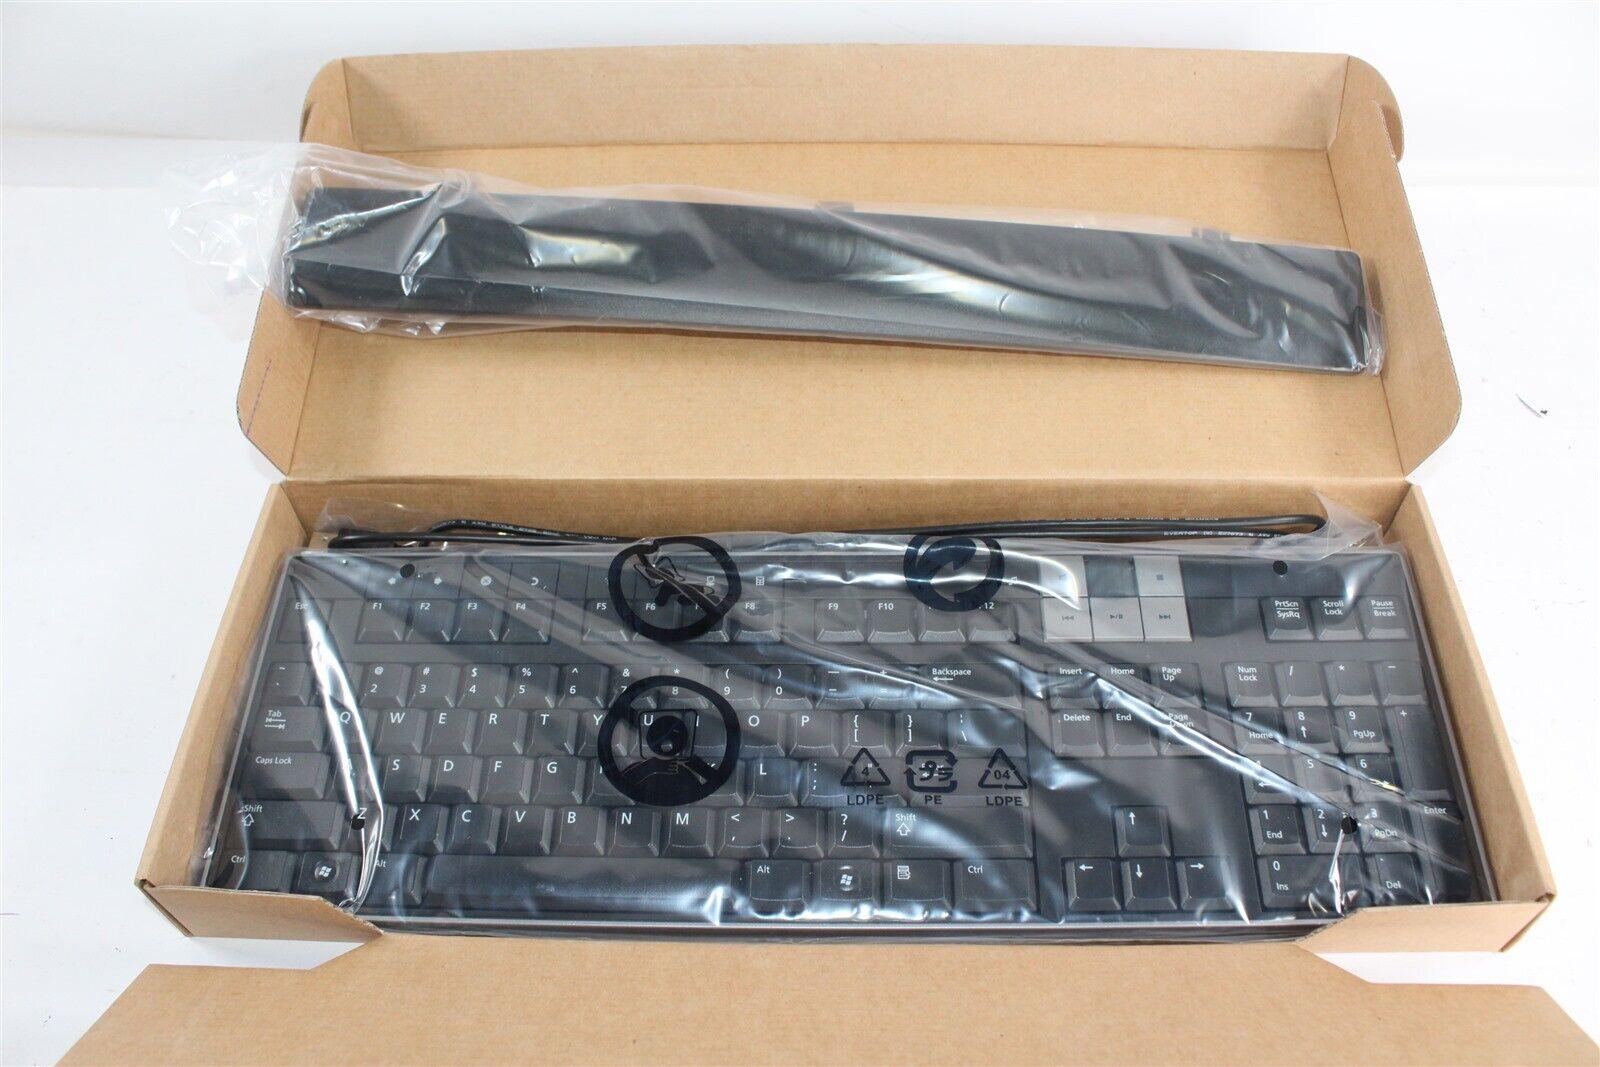 New Dell U473D USB Wired Slim Multimedia Keyboard w/ 2 USB Ports & Wrist Rest . Buy it now for 49.95